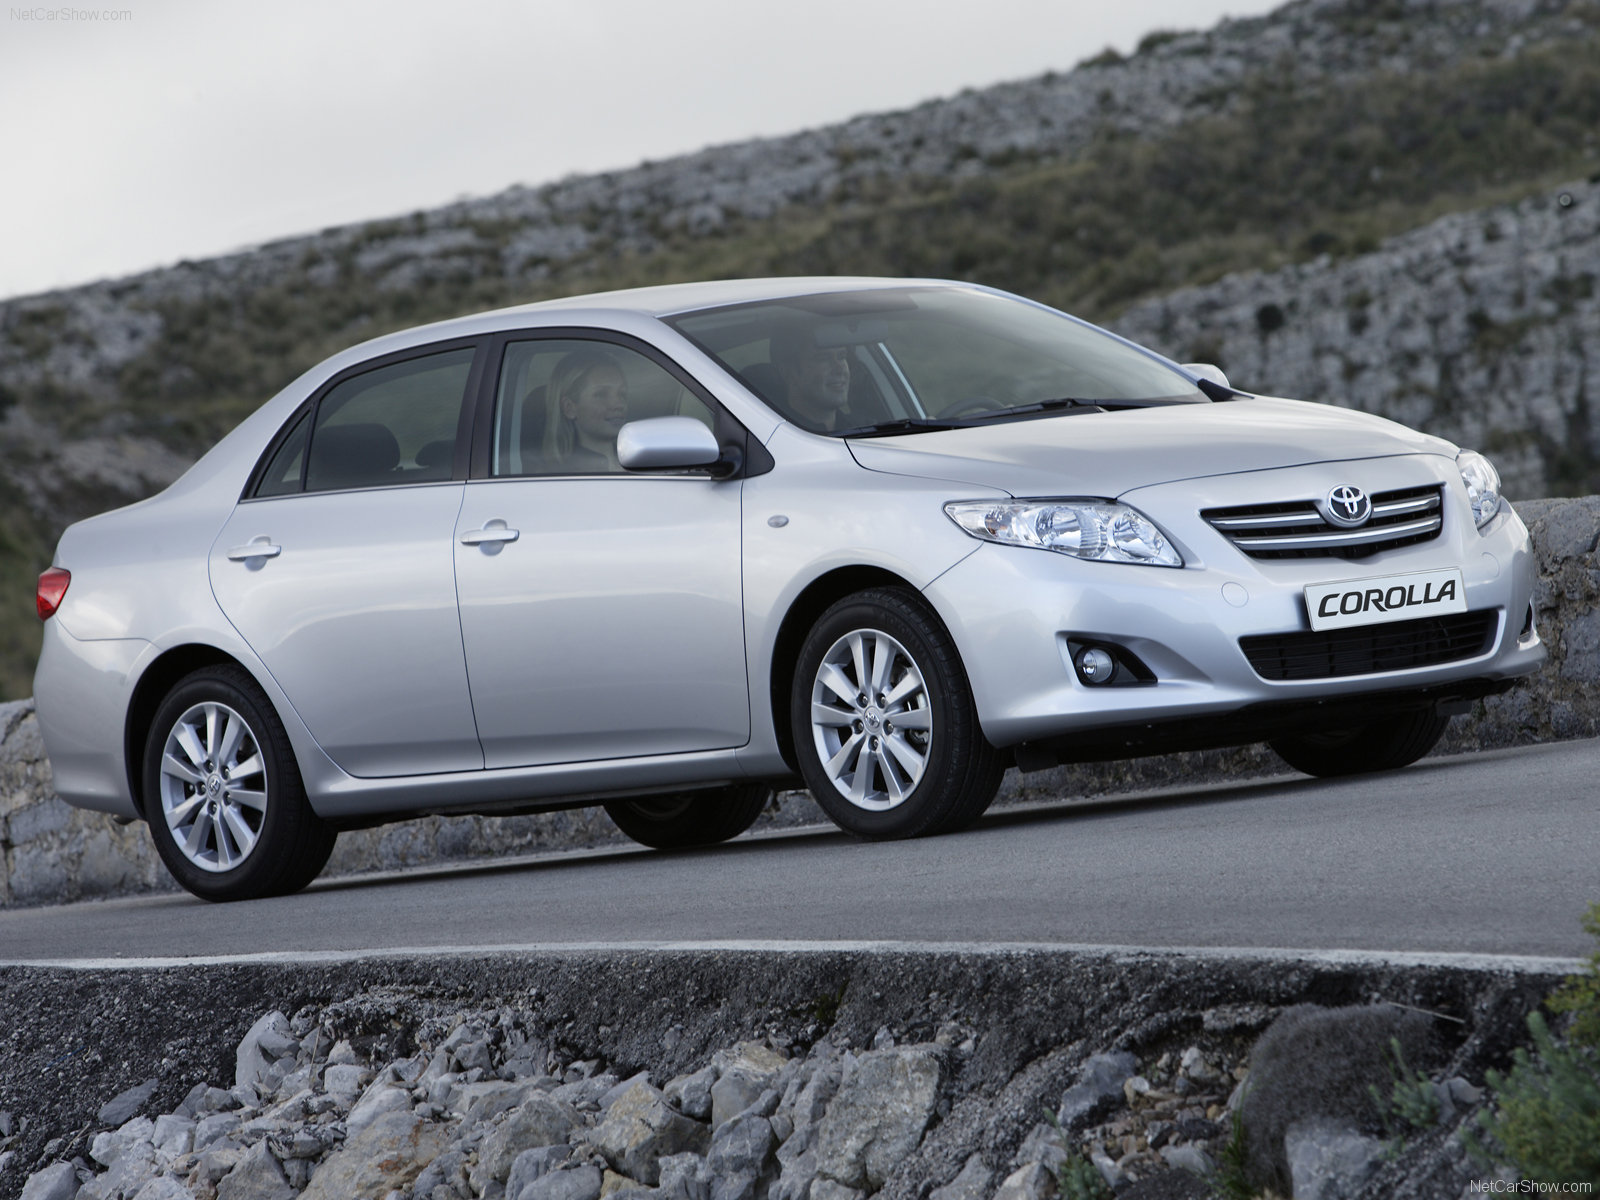 Toyota Королла фото #10